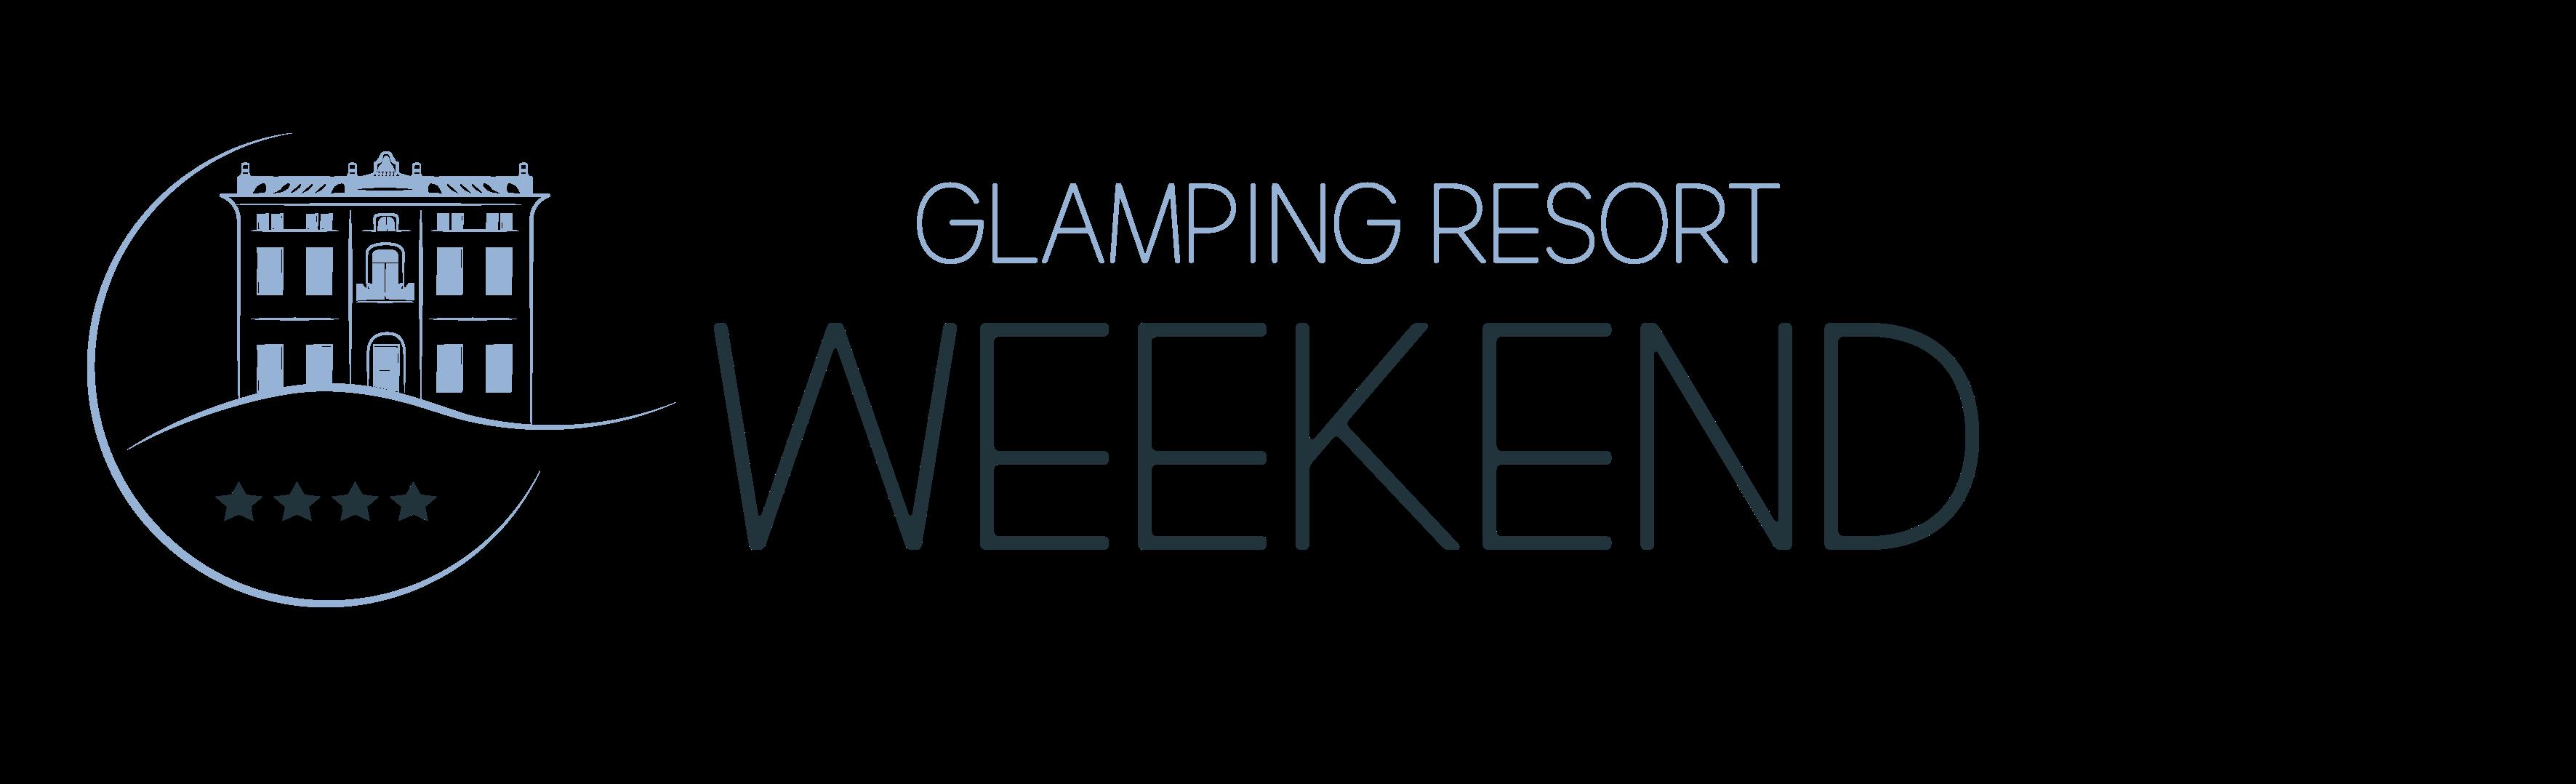 Weekend Glamping Resort